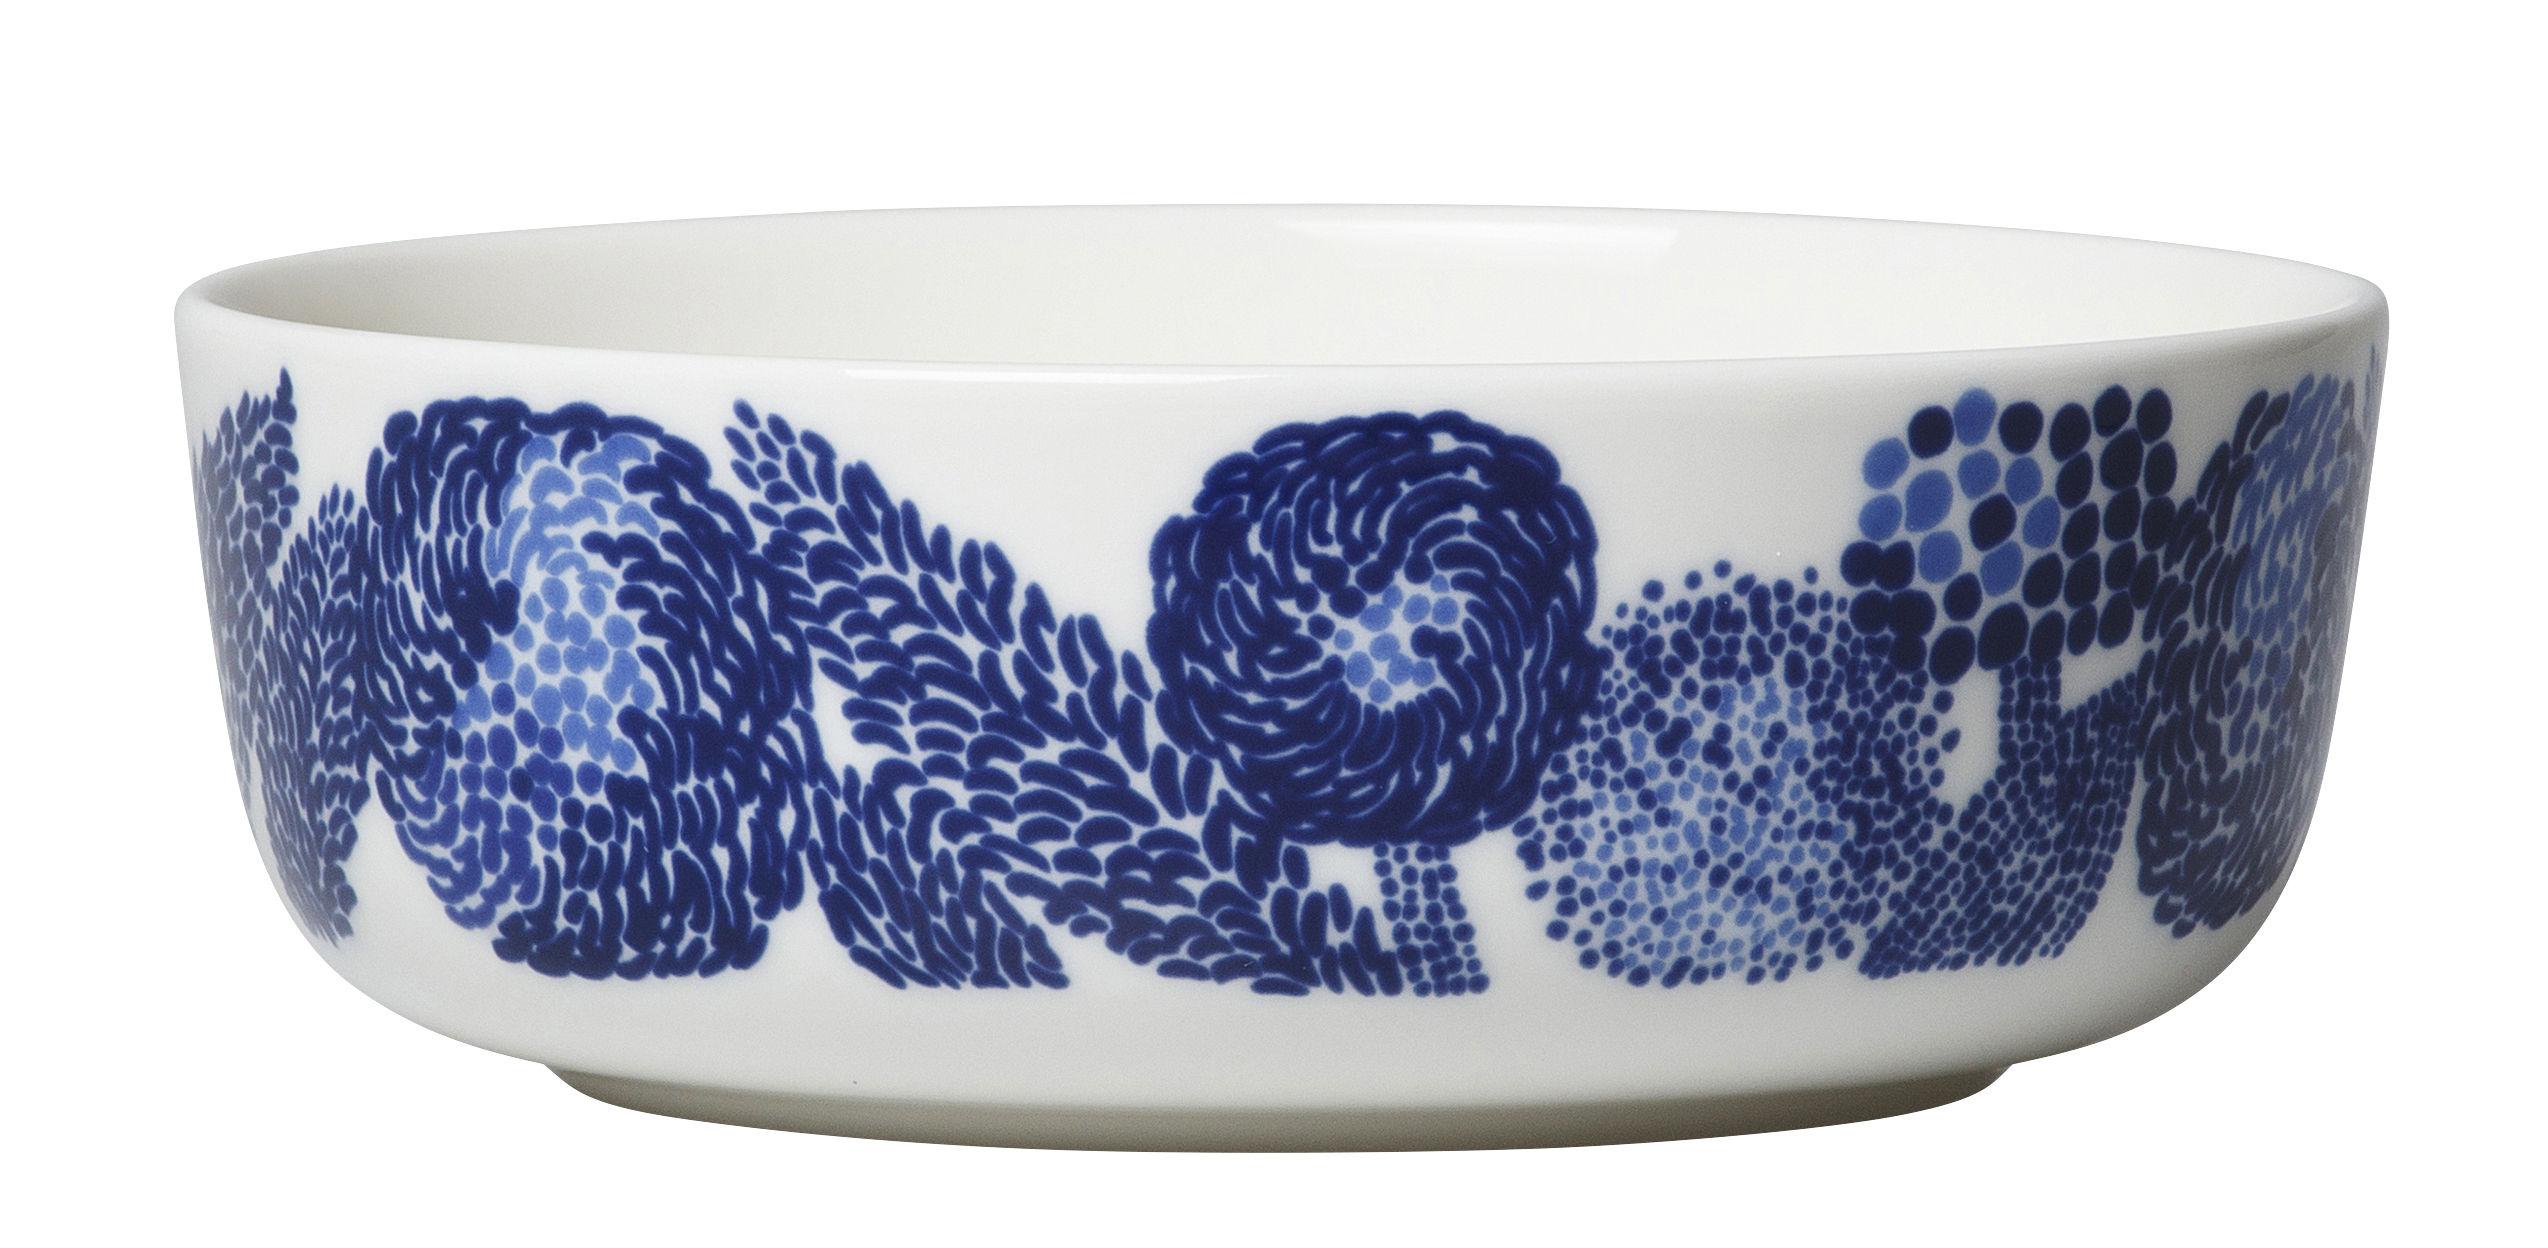 Arts de la table - Saladiers, coupes et bols - Bol Oiva Mynsteri / Ø 13 cm - Marimekko - Mynsteri / Blanc & bleu - Grès